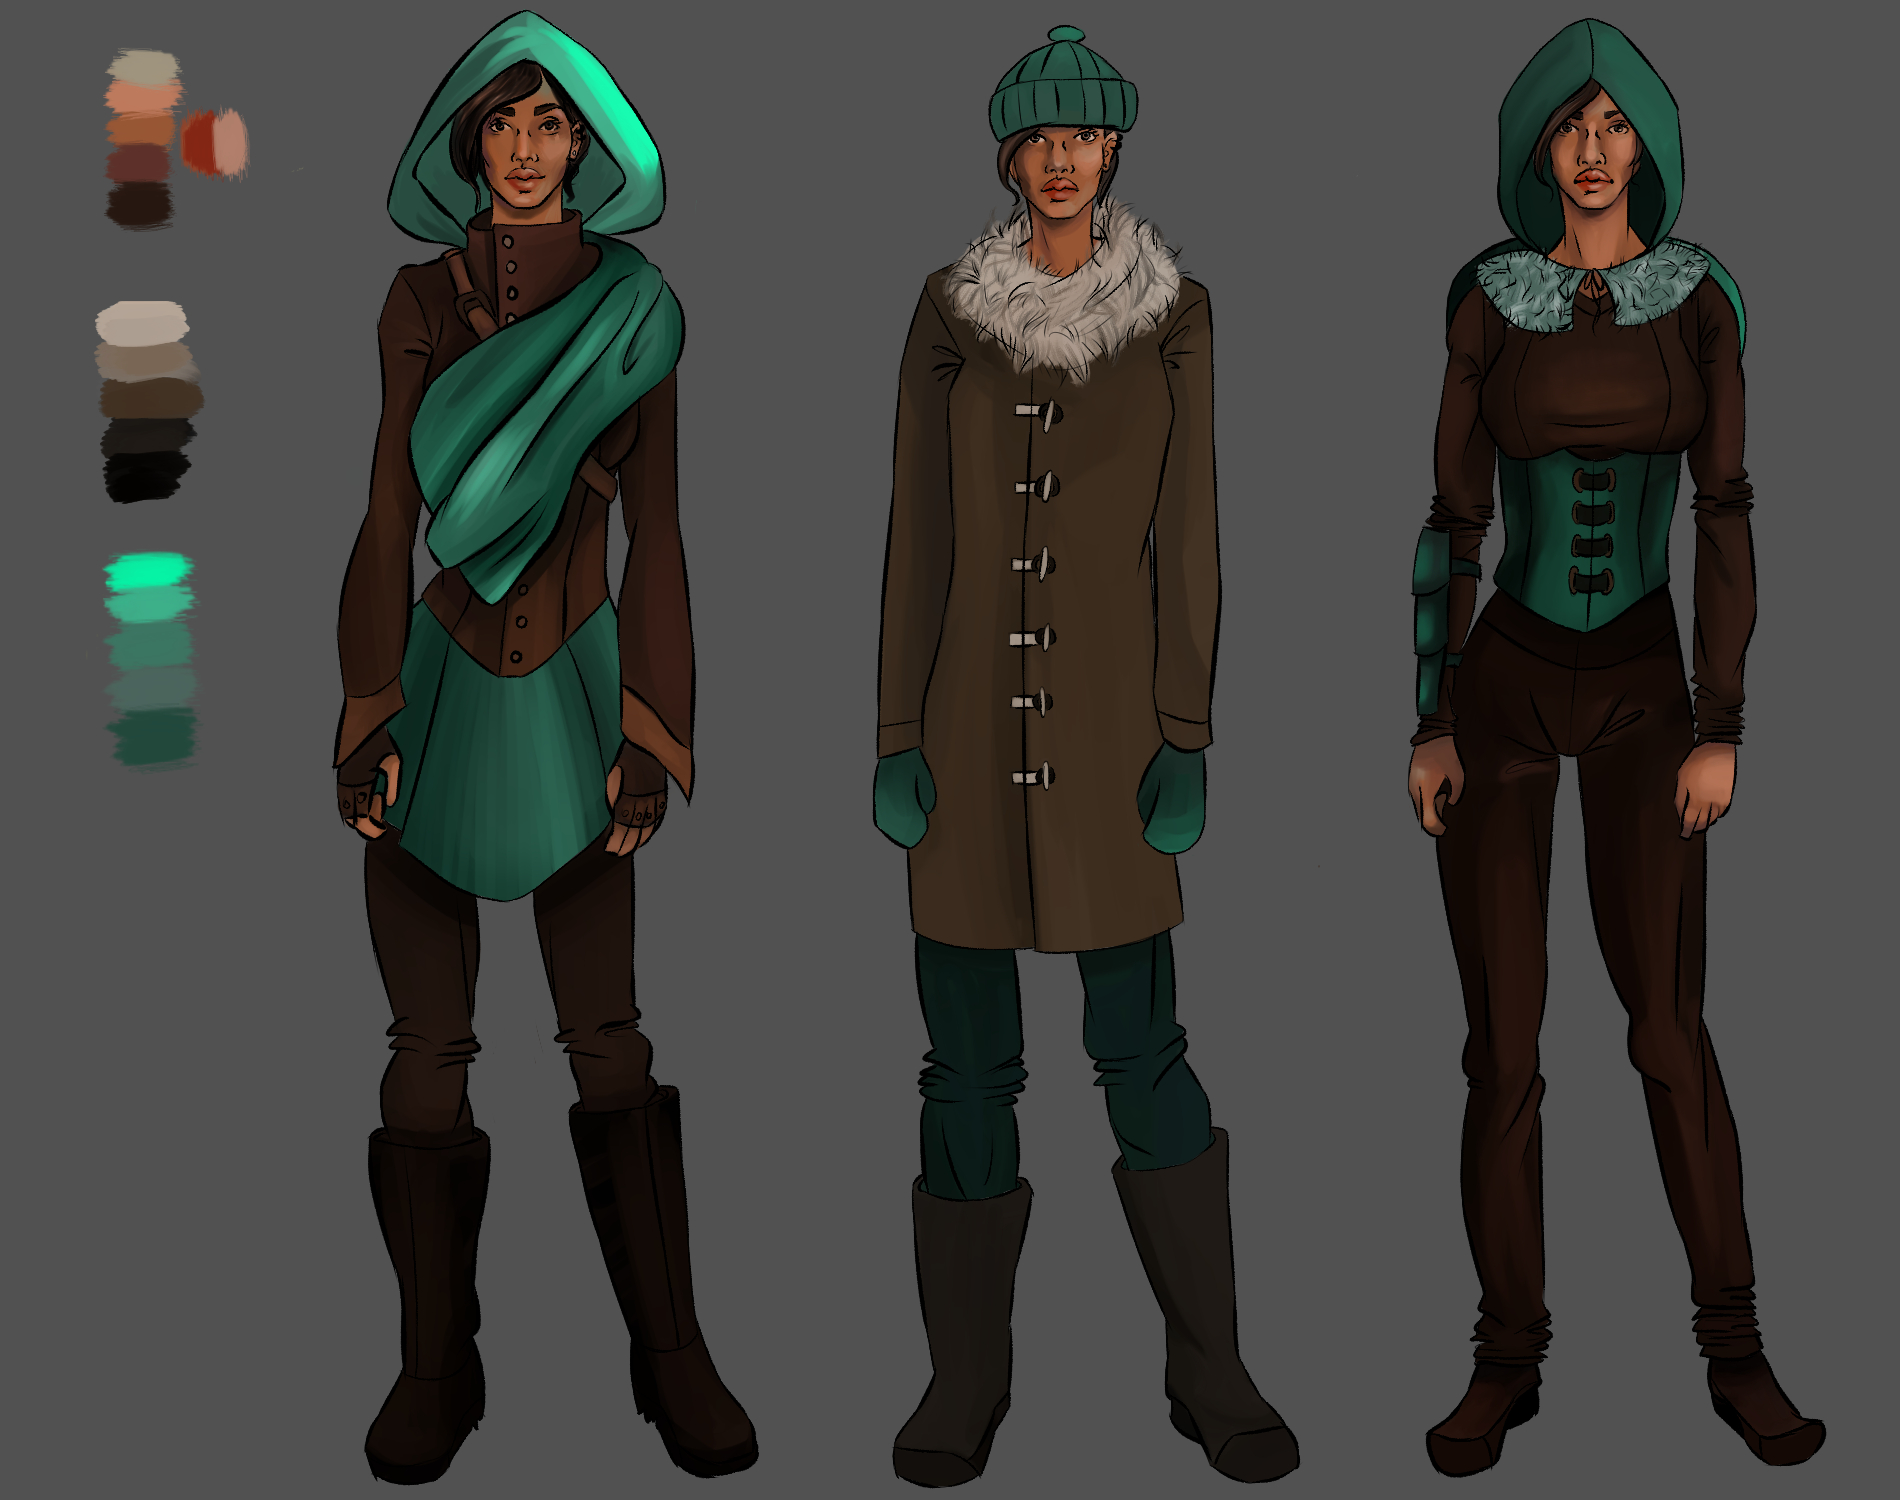 Annika Character Design #1